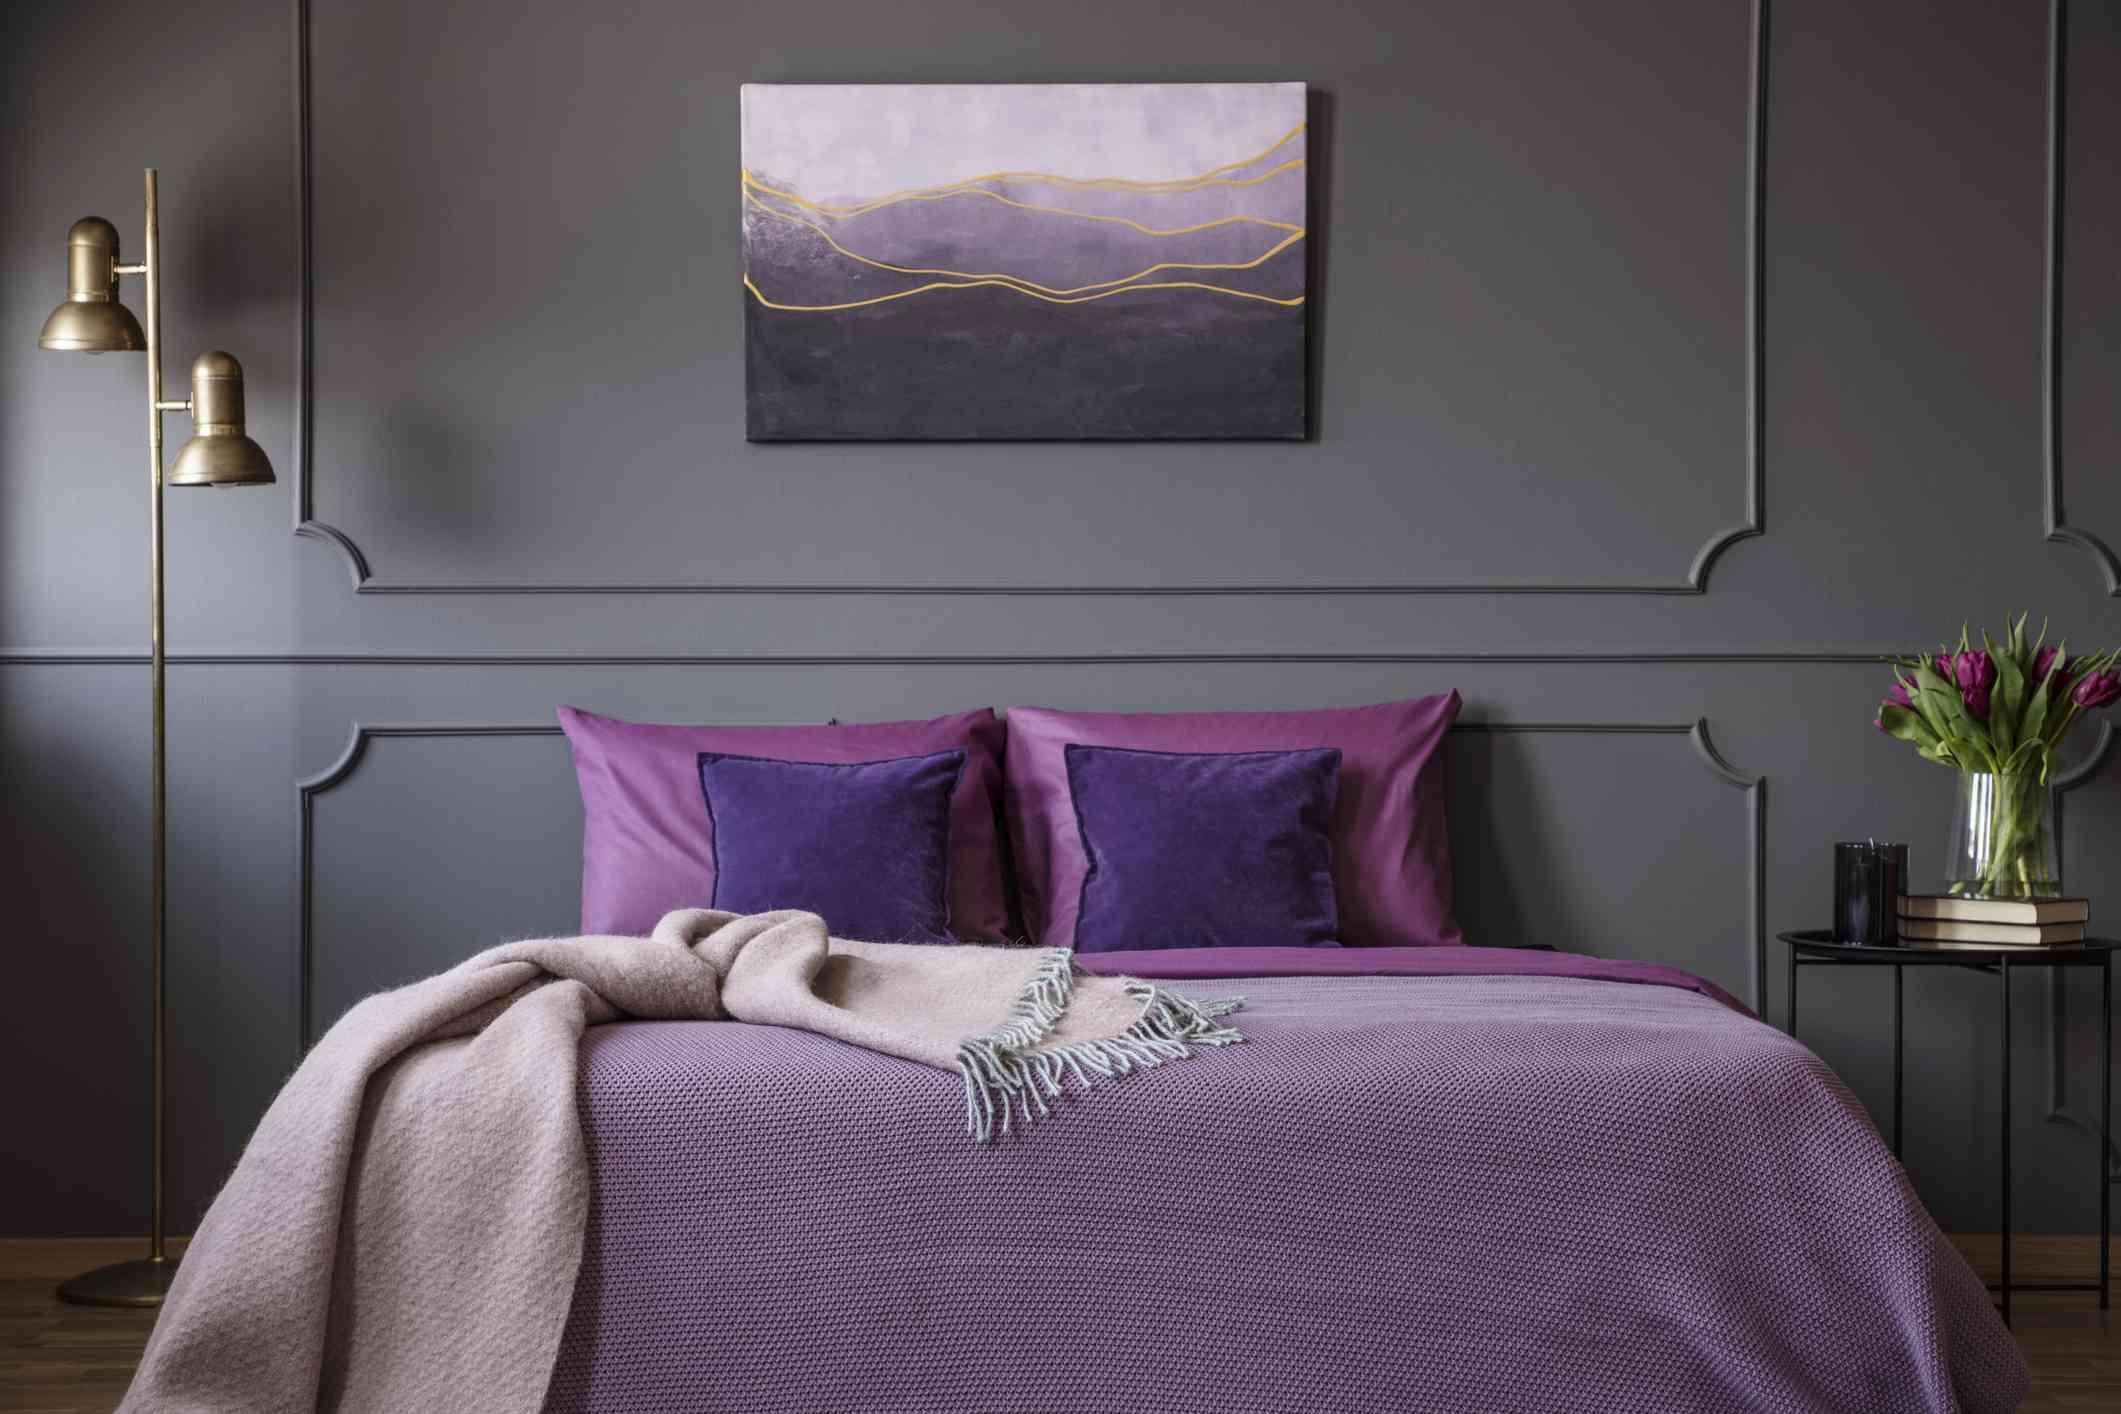 Purple linens in a bedroom